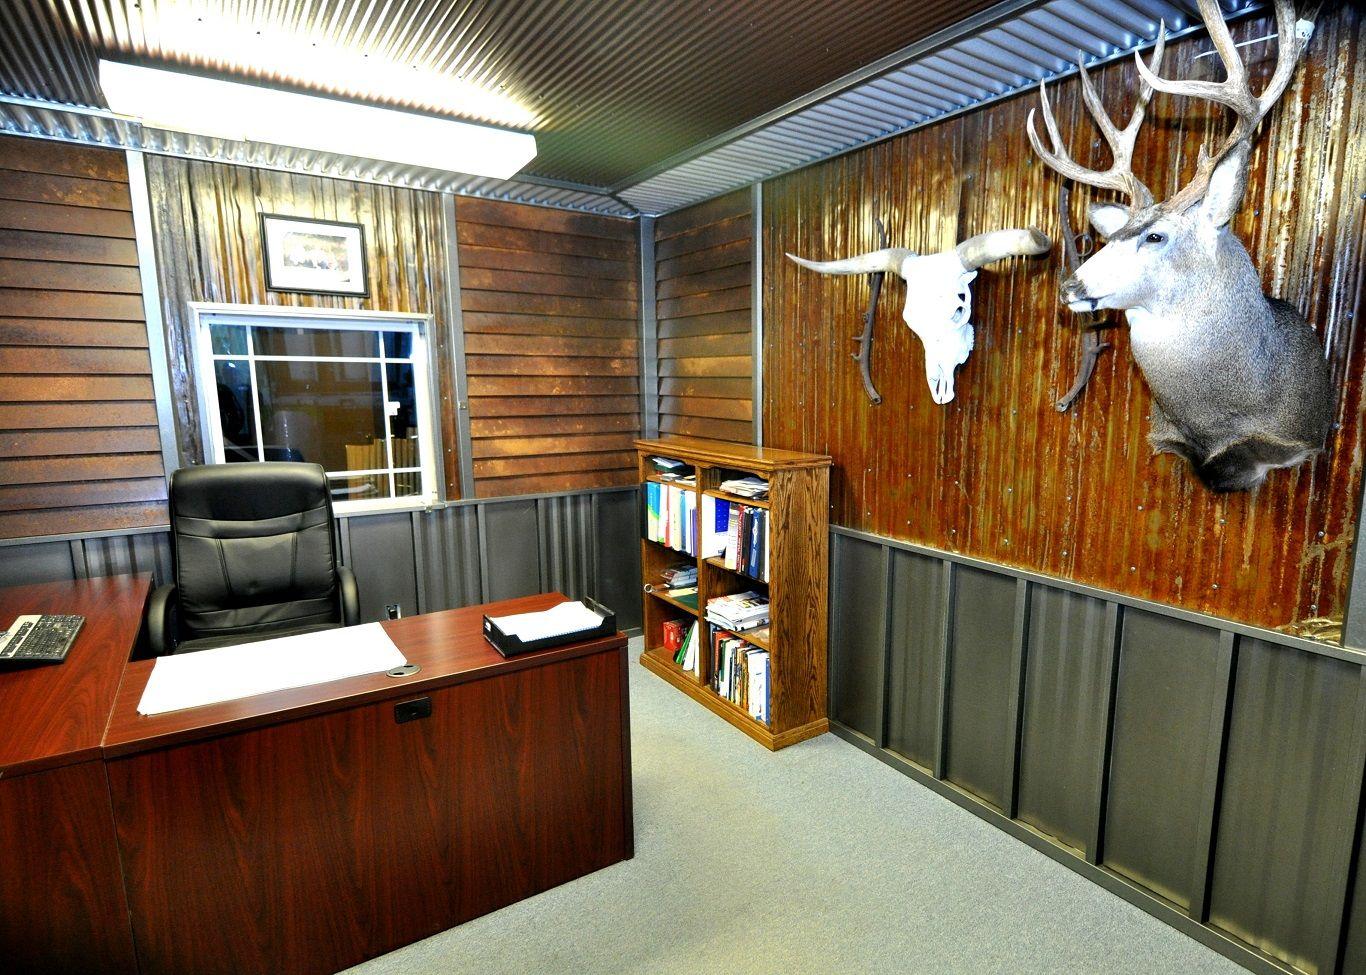 Interior Corrugated Metal Wall Panels Metal Diy Design Decor In 2020 Corrugated Metal Wall Metal Wall Panel Garage Interior